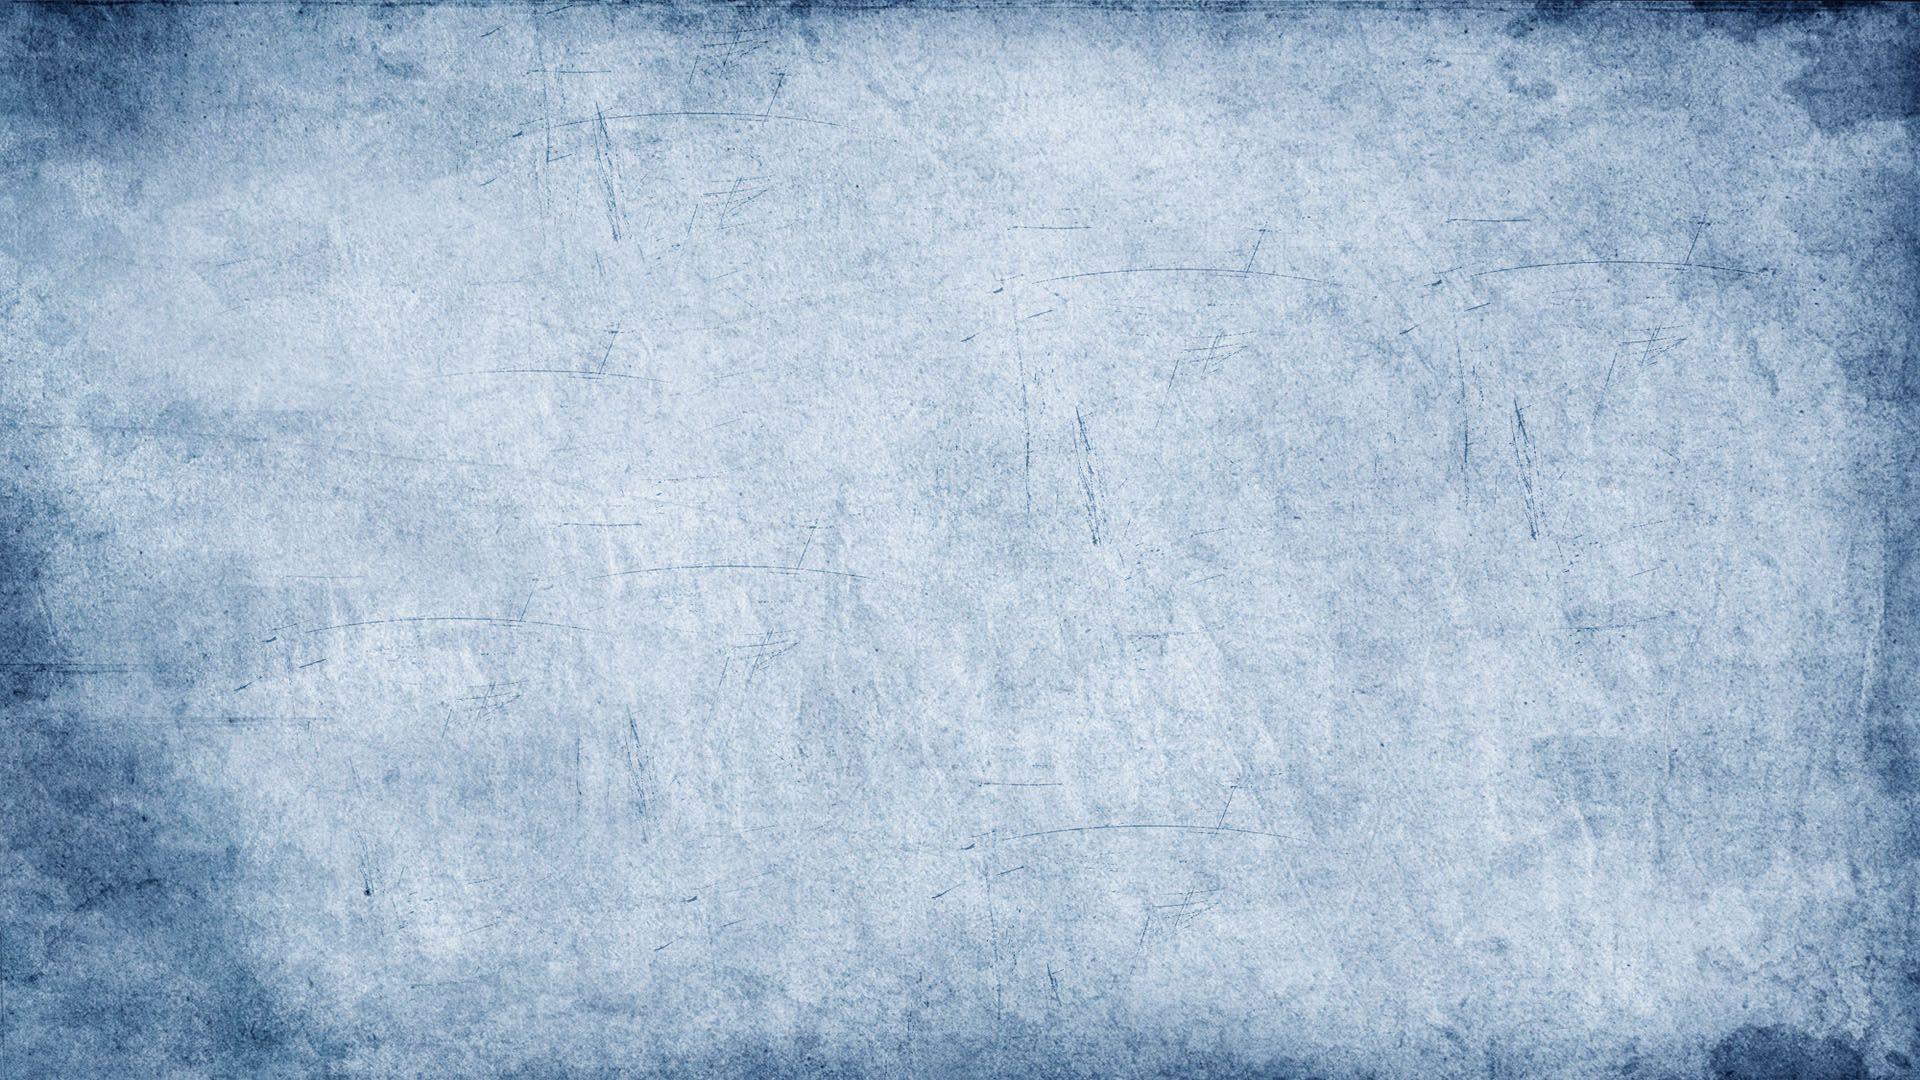 Best Background For Website wallpaper download